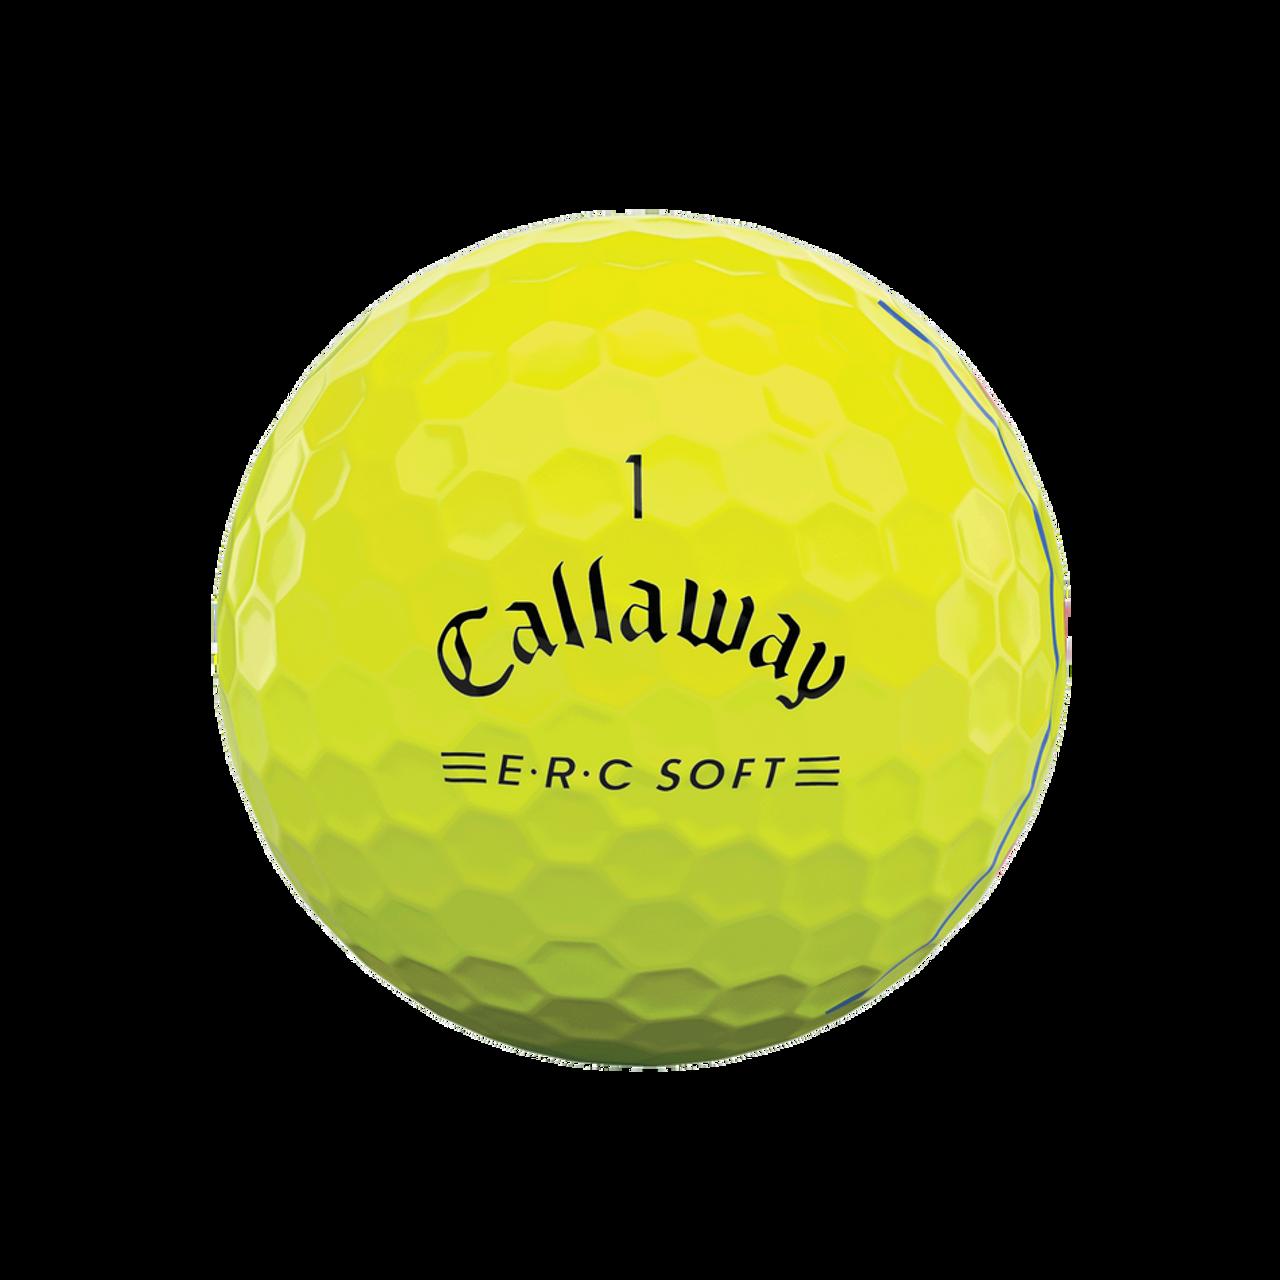 Callaway ERC Soft Triple Track Yellow Dozen Golf Balls